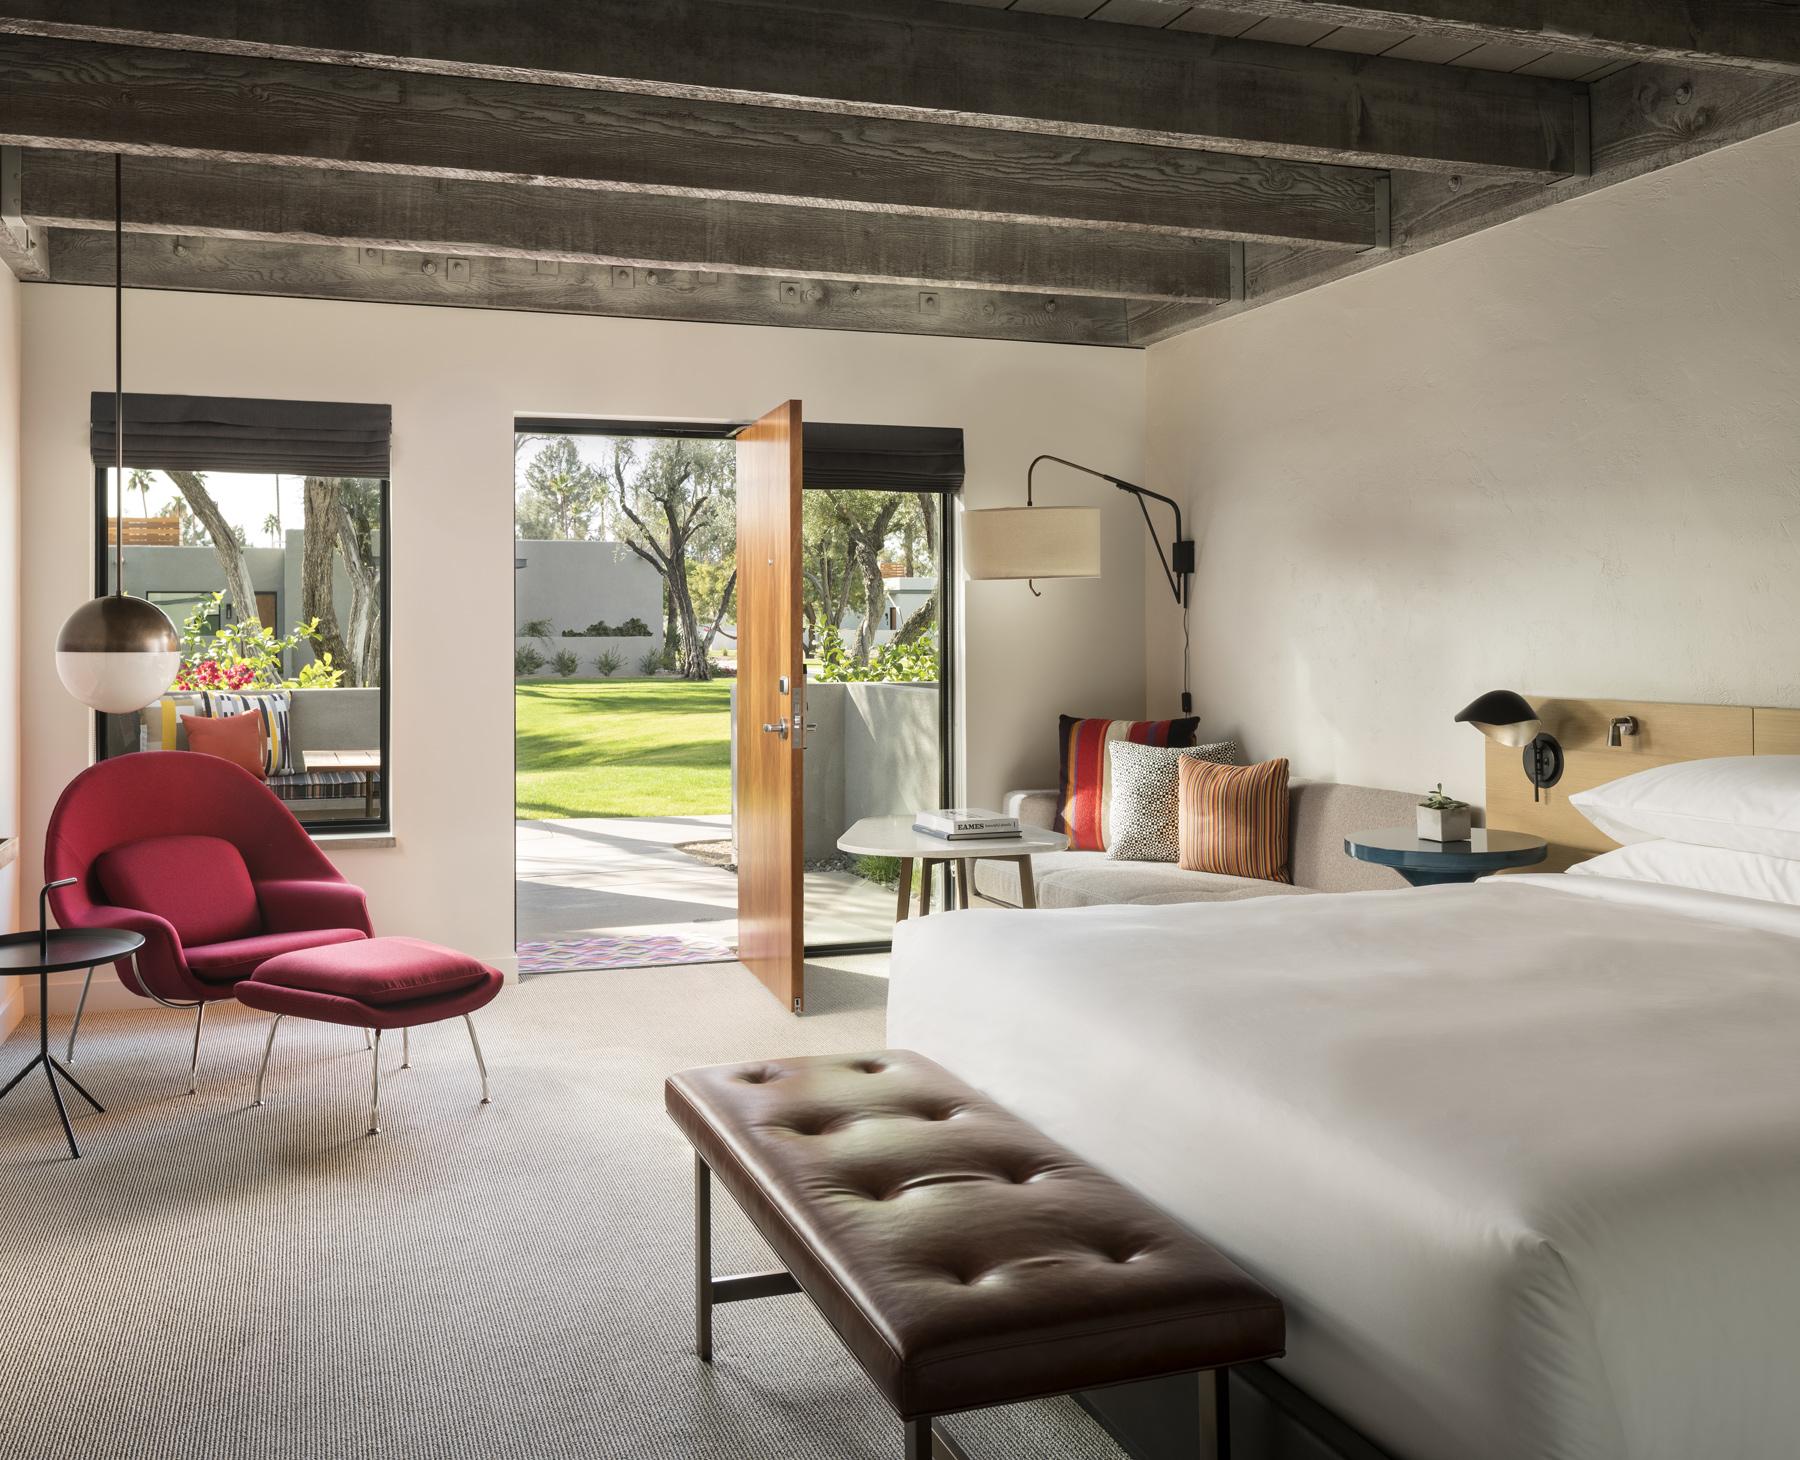 ANDAZ SCOTTSDALE RESORT & SPA | Resort eBrochure